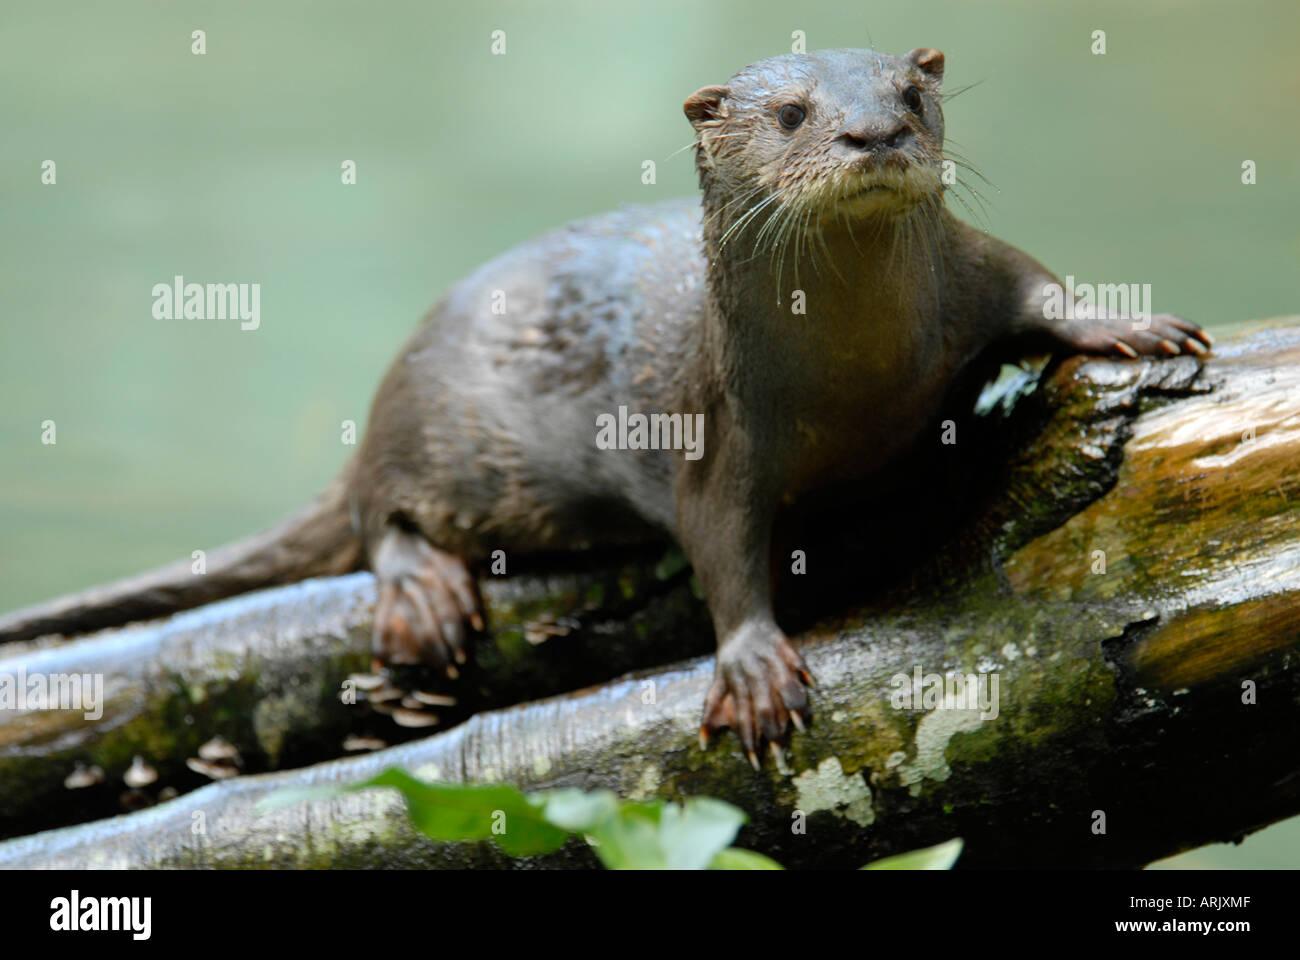 Neotropische Otter Lutra Longicaudis. Amazonas-Regenwald Stockfoto